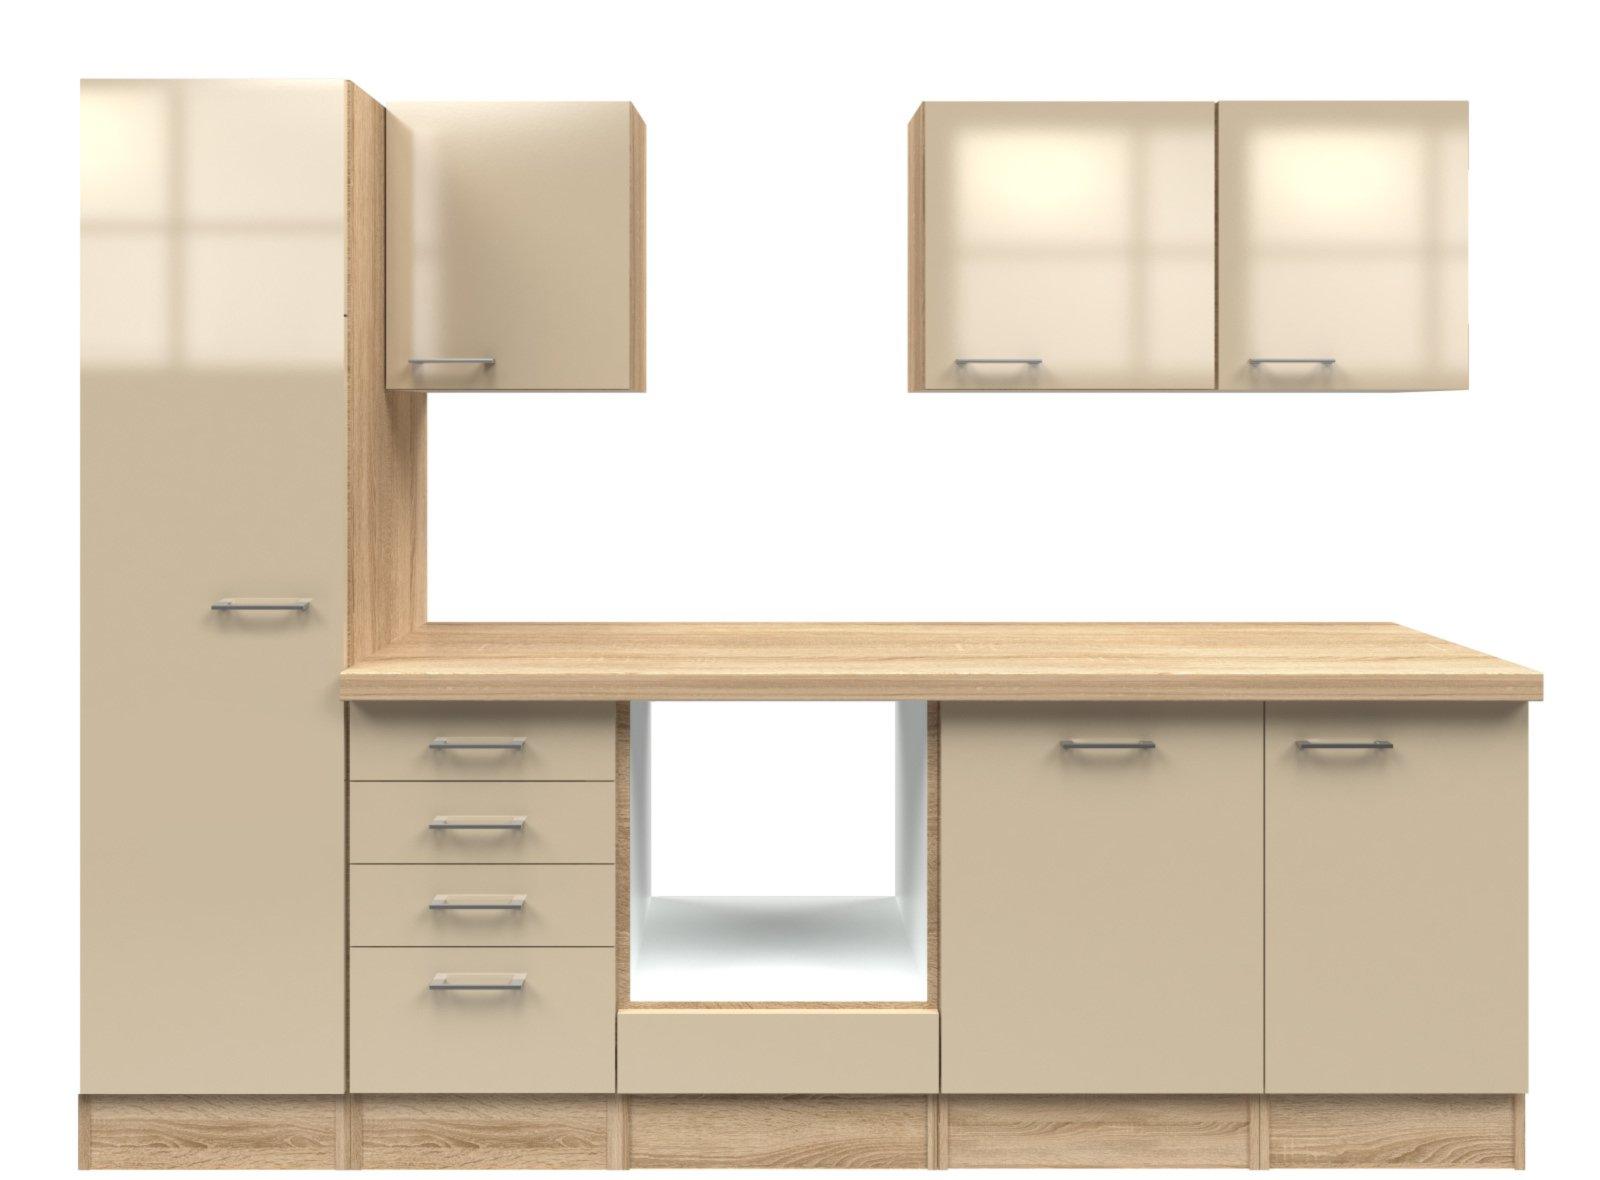 k chenblock nepal kaschmir glanz sonoma eiche 270 cm. Black Bedroom Furniture Sets. Home Design Ideas